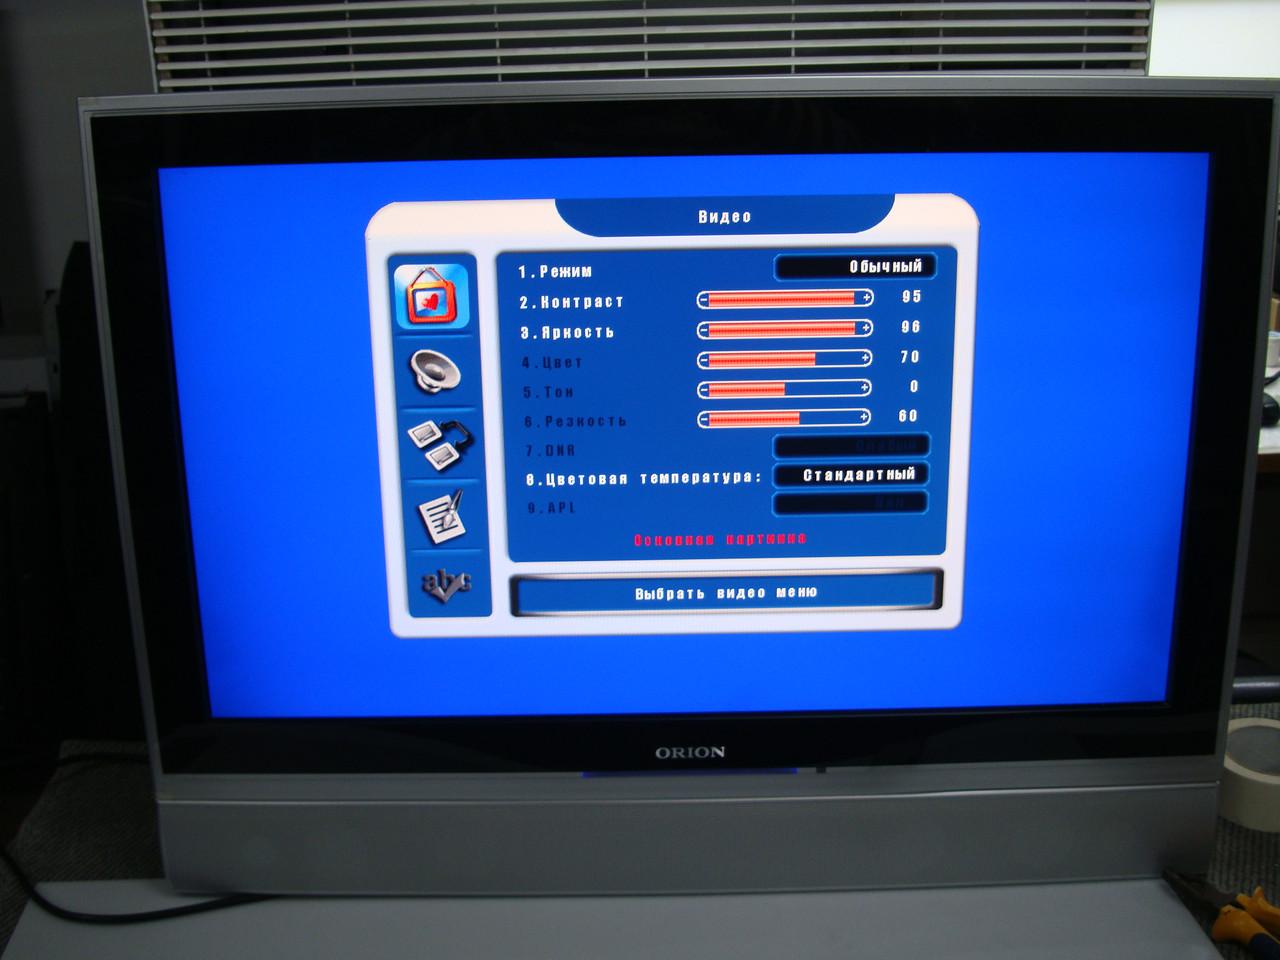 LCD телевизор Orion LCD 3212 с хорошим звуком